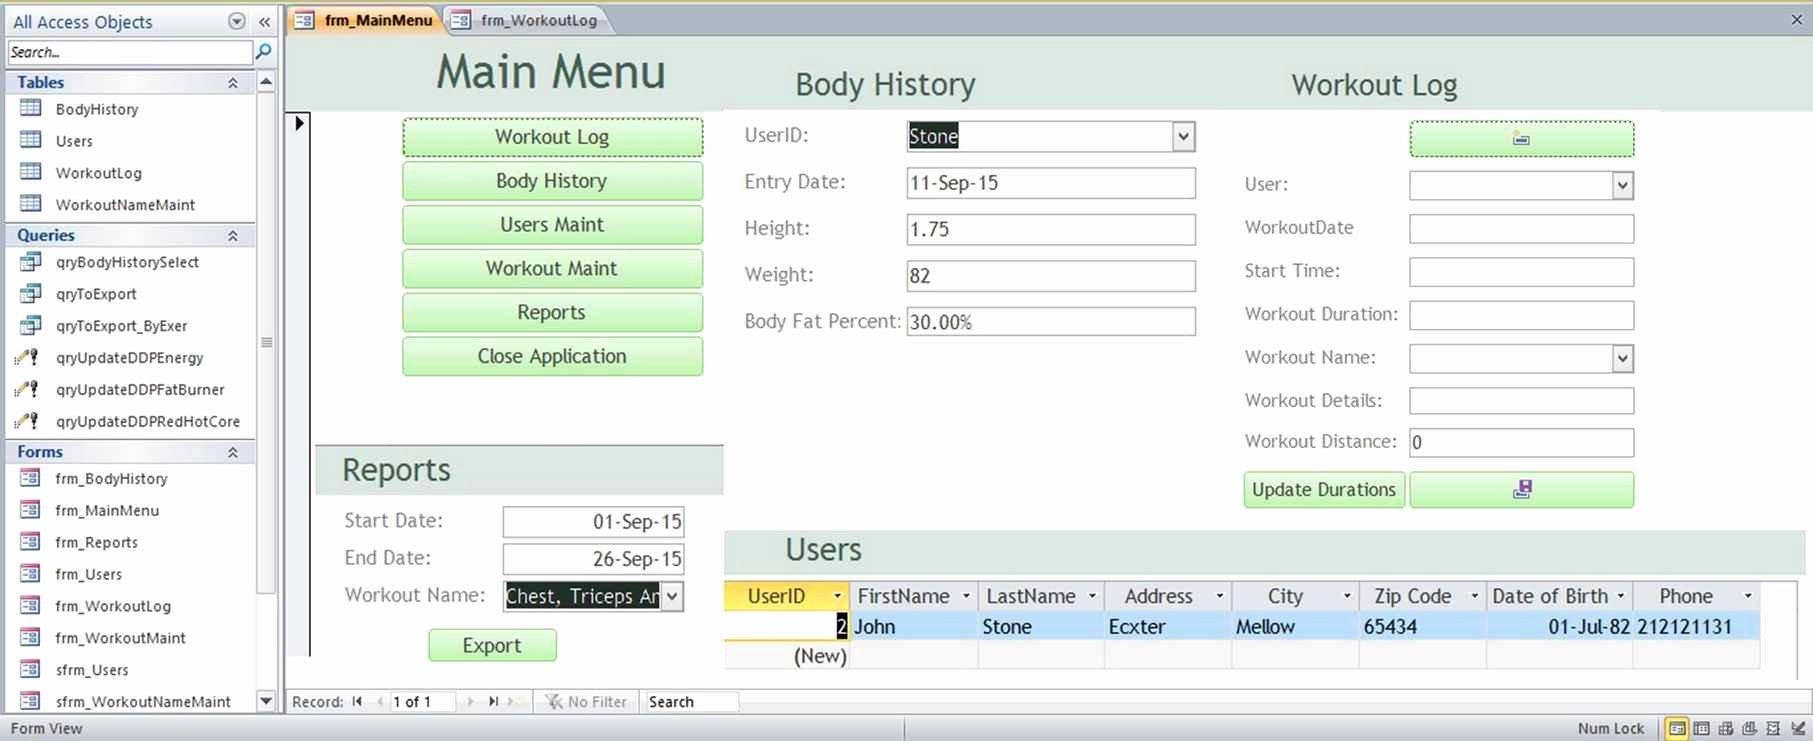 microsoft access family tree genealogy history templates database 584